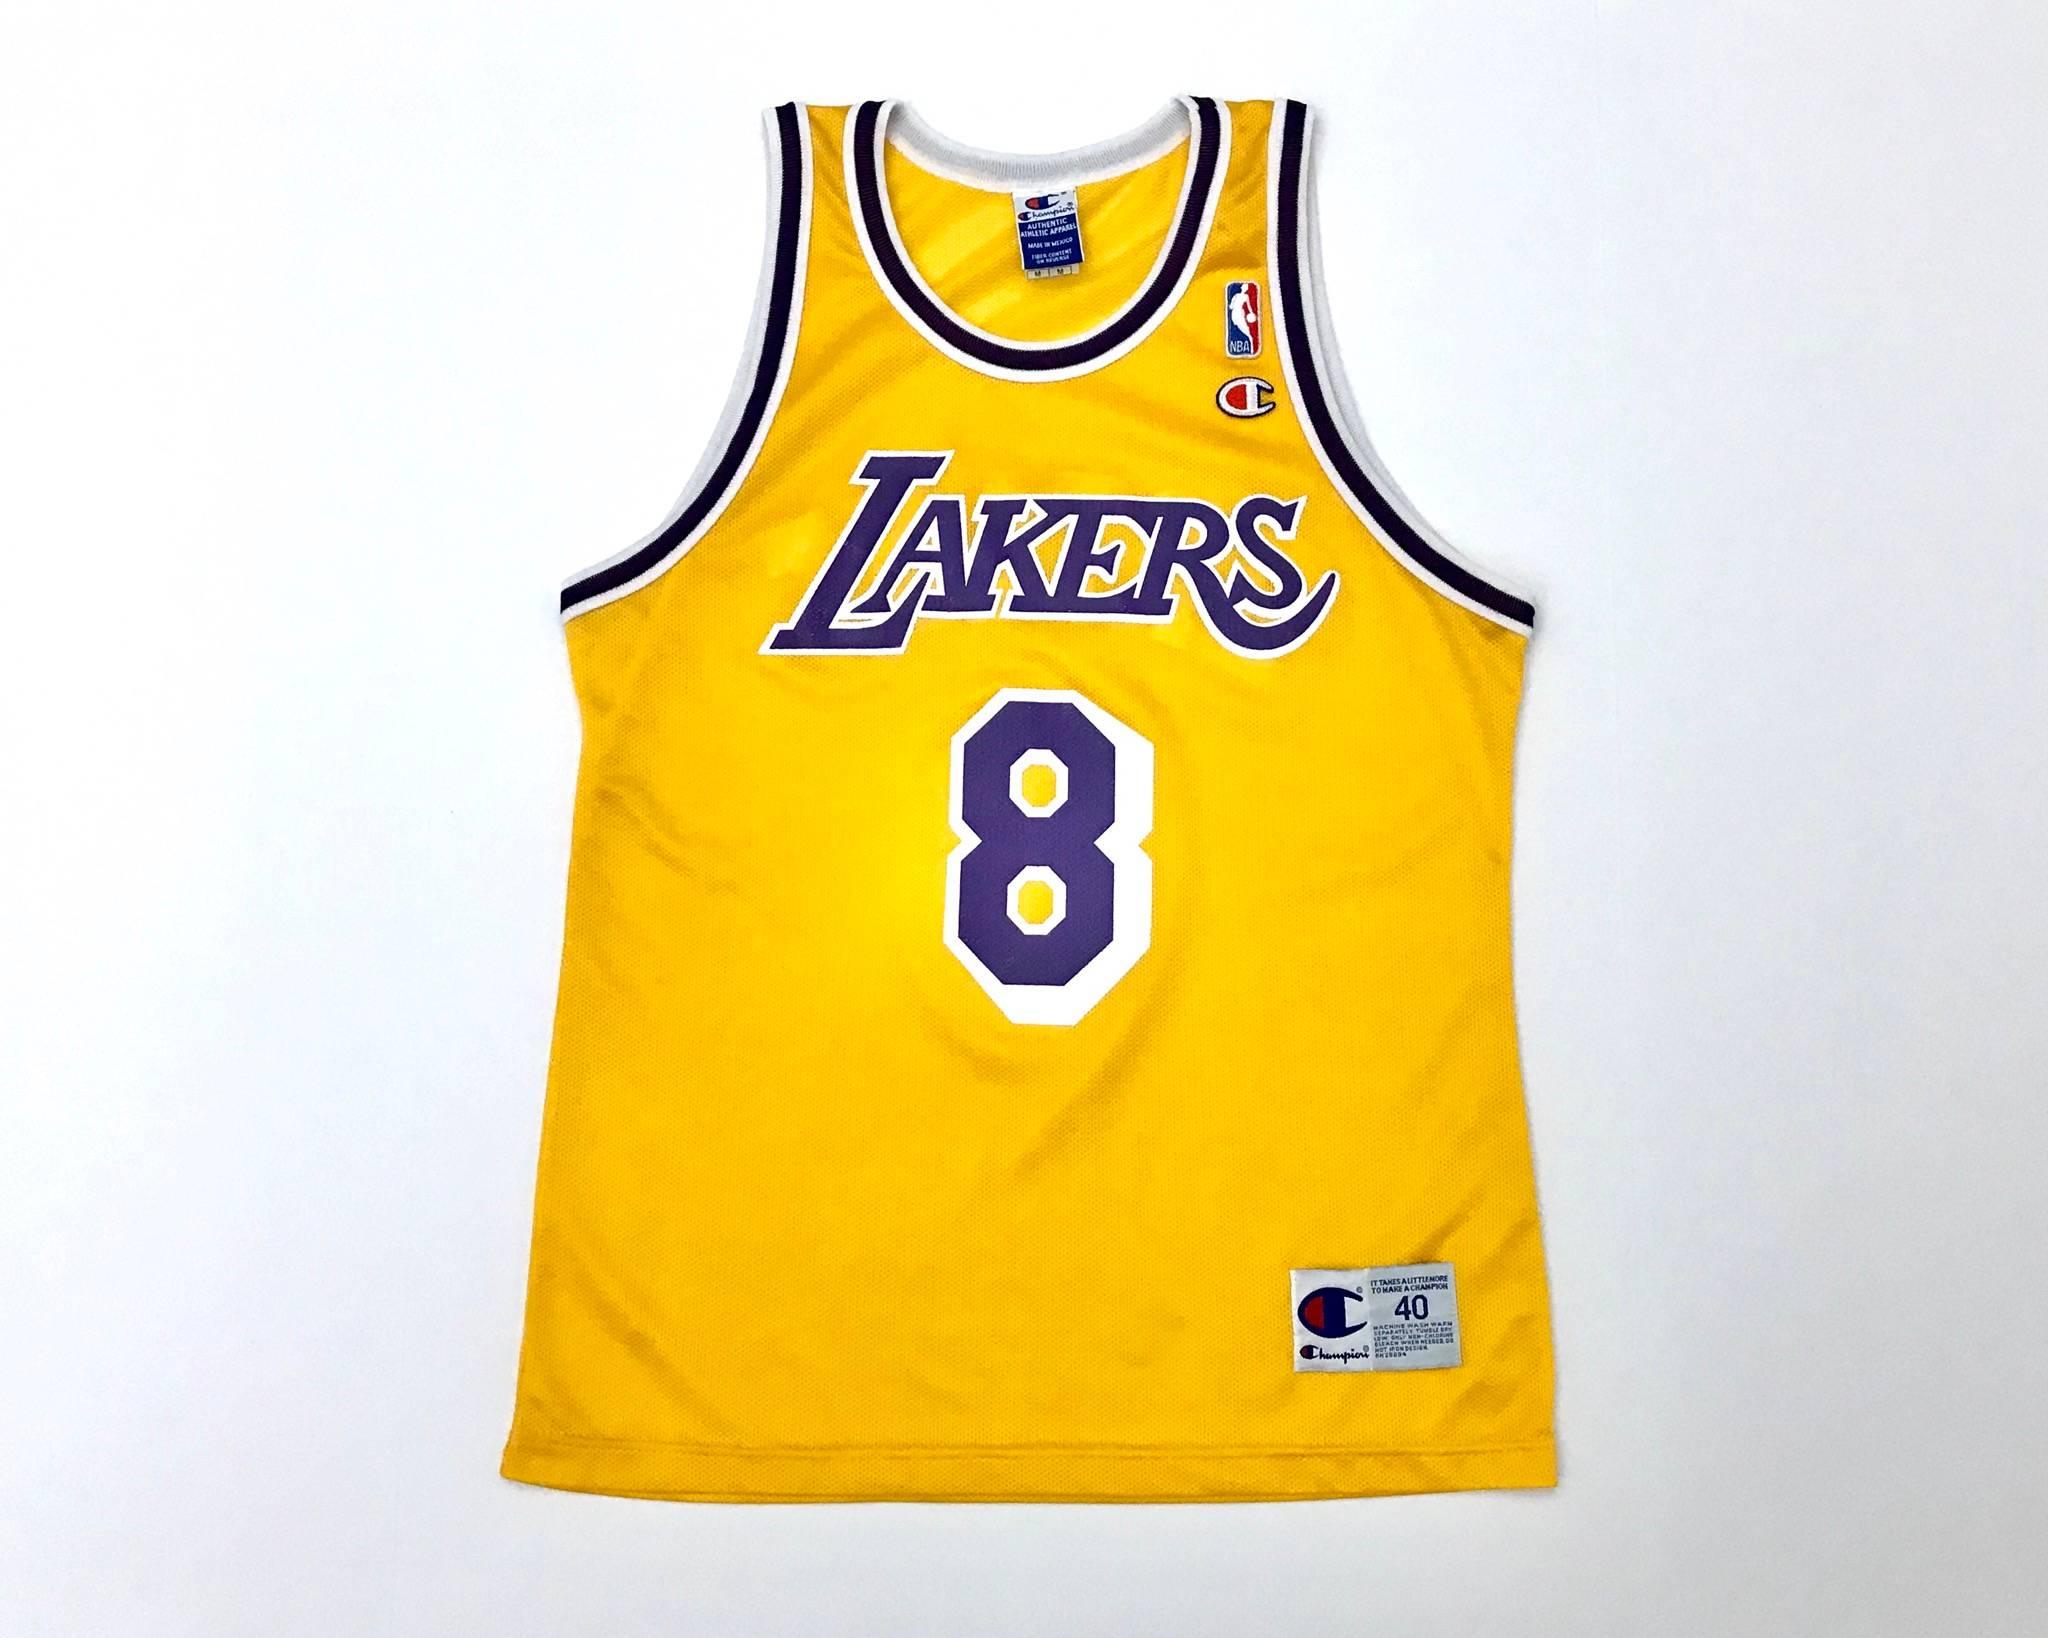 Vintage Vintage Kobe Bryant Lakers Jersey Authentic Champion Rookie